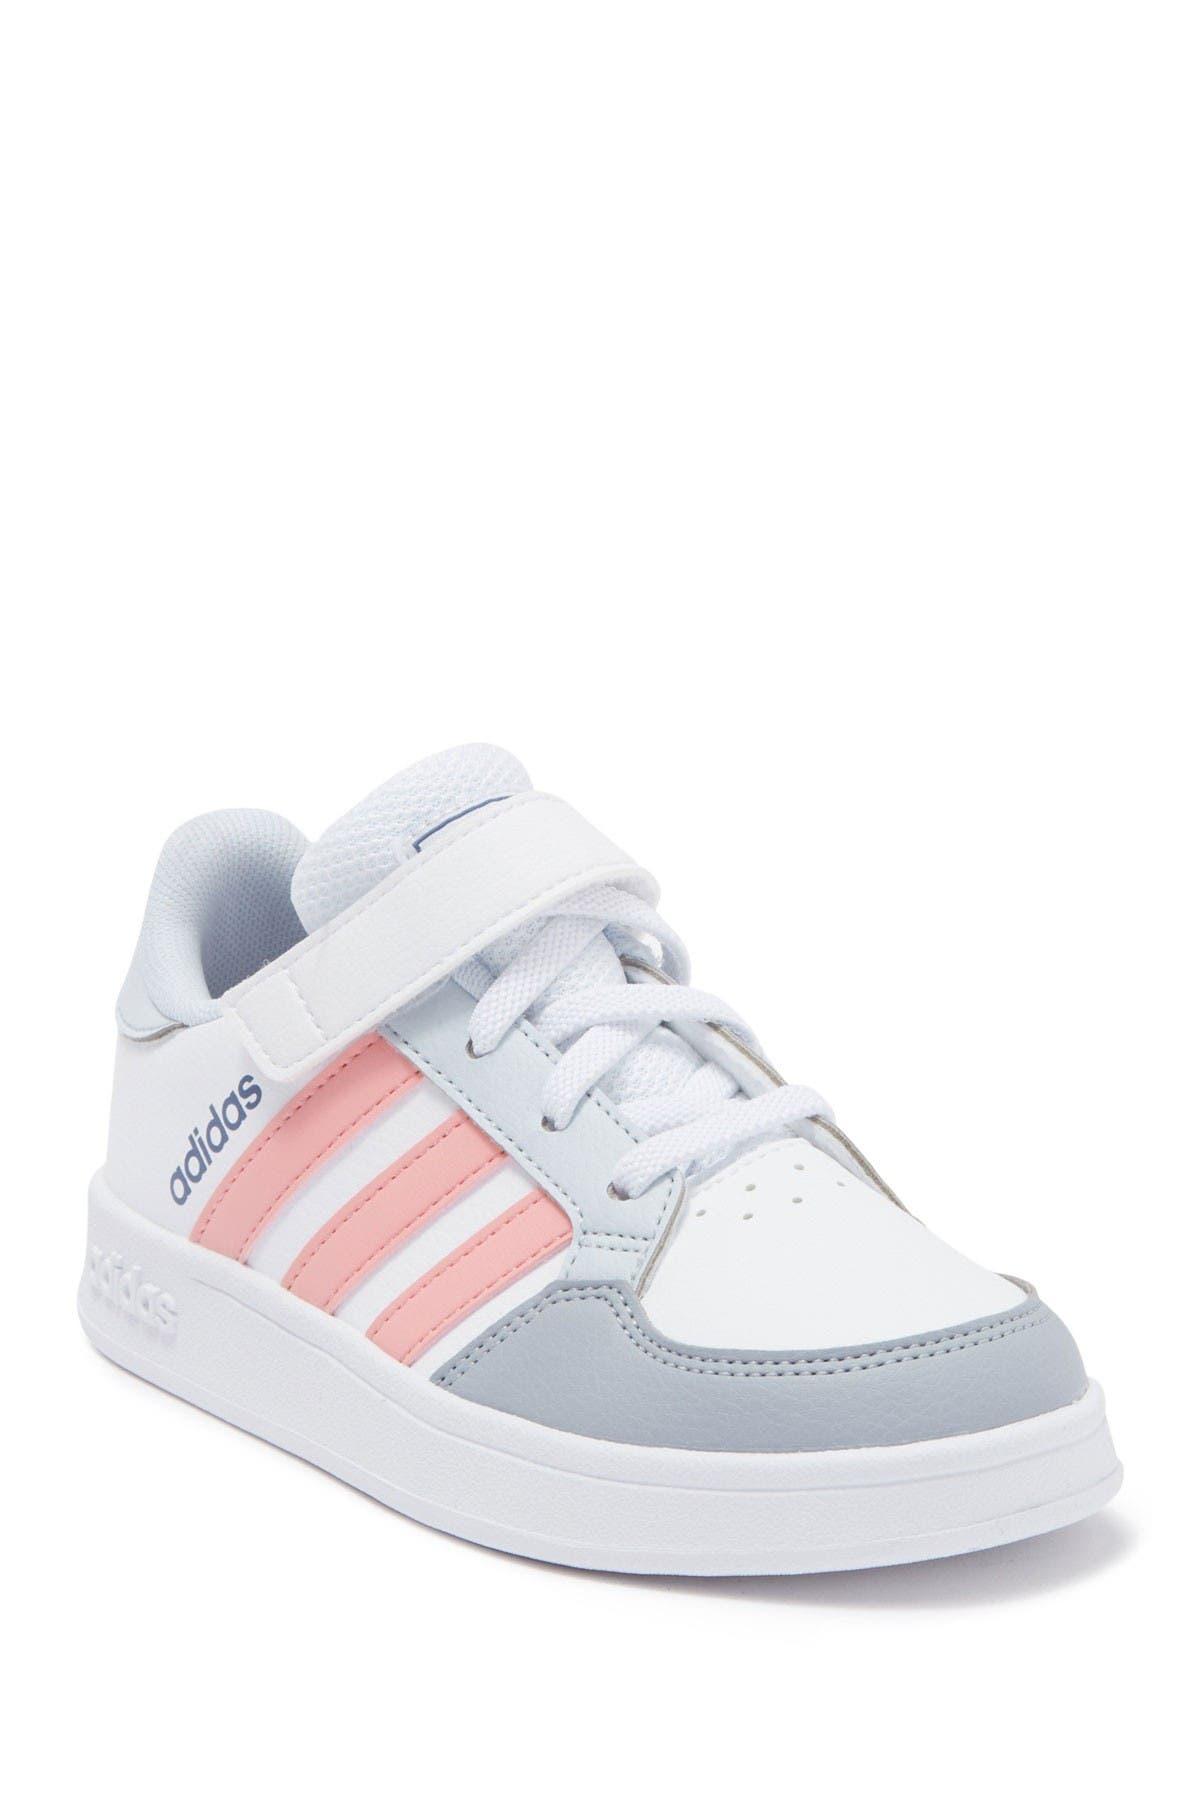 Image of adidas Breaknet Shoe